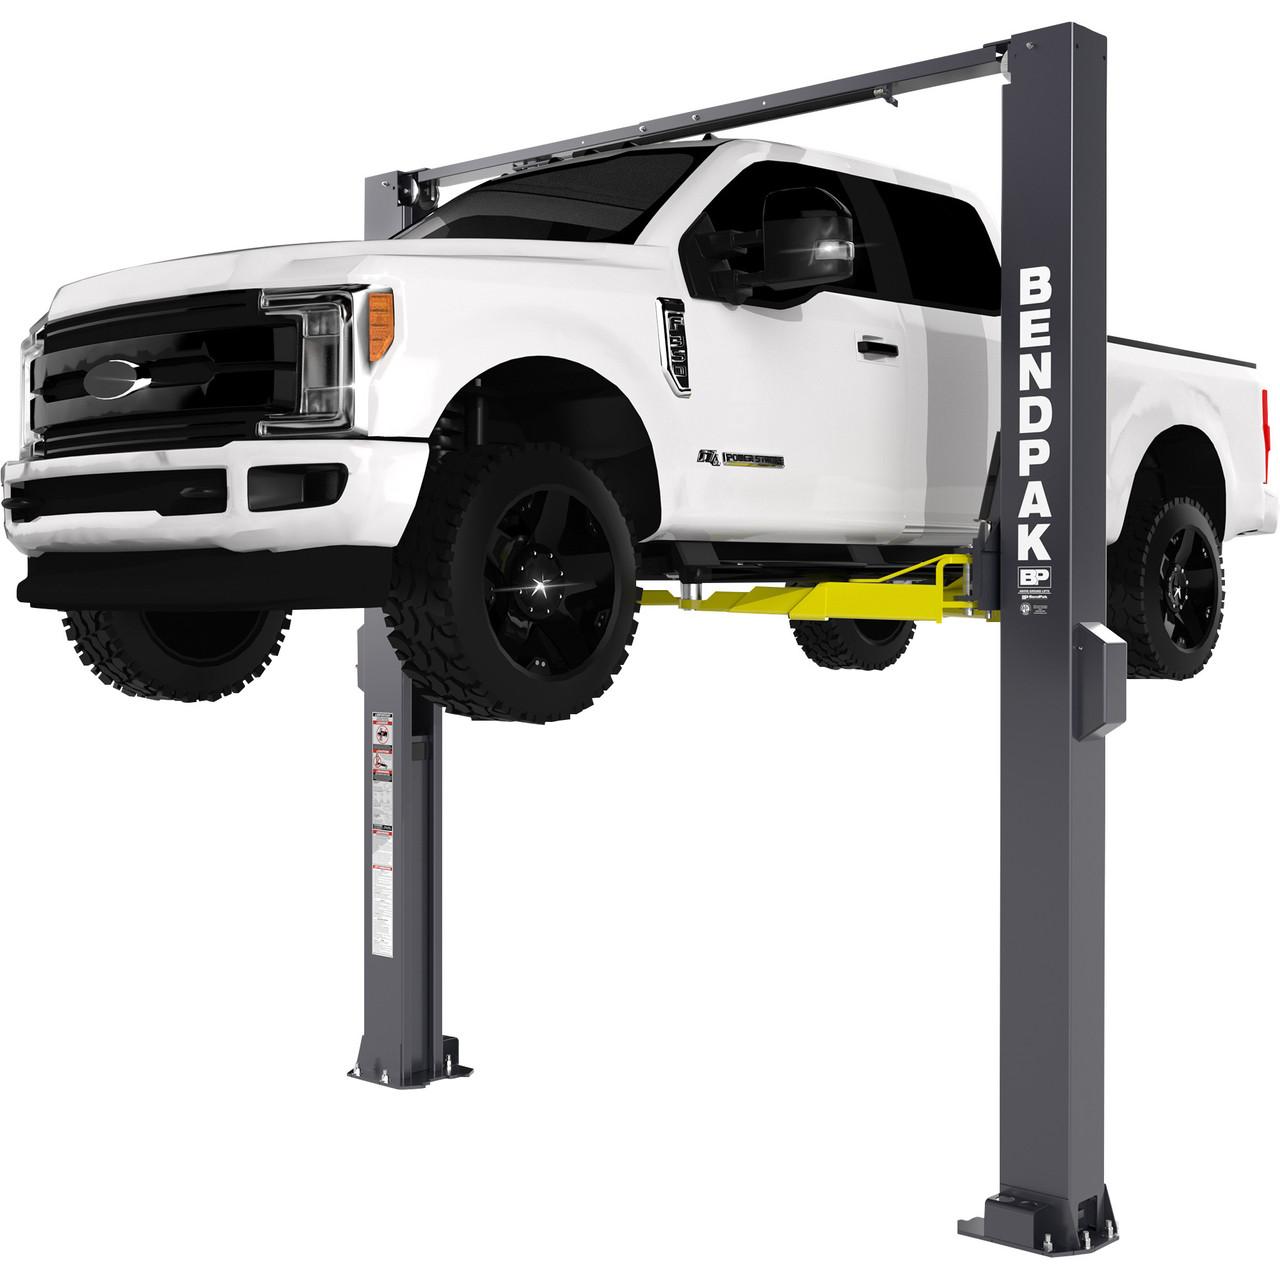 BENDPAK XPR-10XLS-181 BendPak Symmetrical Extra-High 2-Post Lift — 10,000-Lb. Capacity